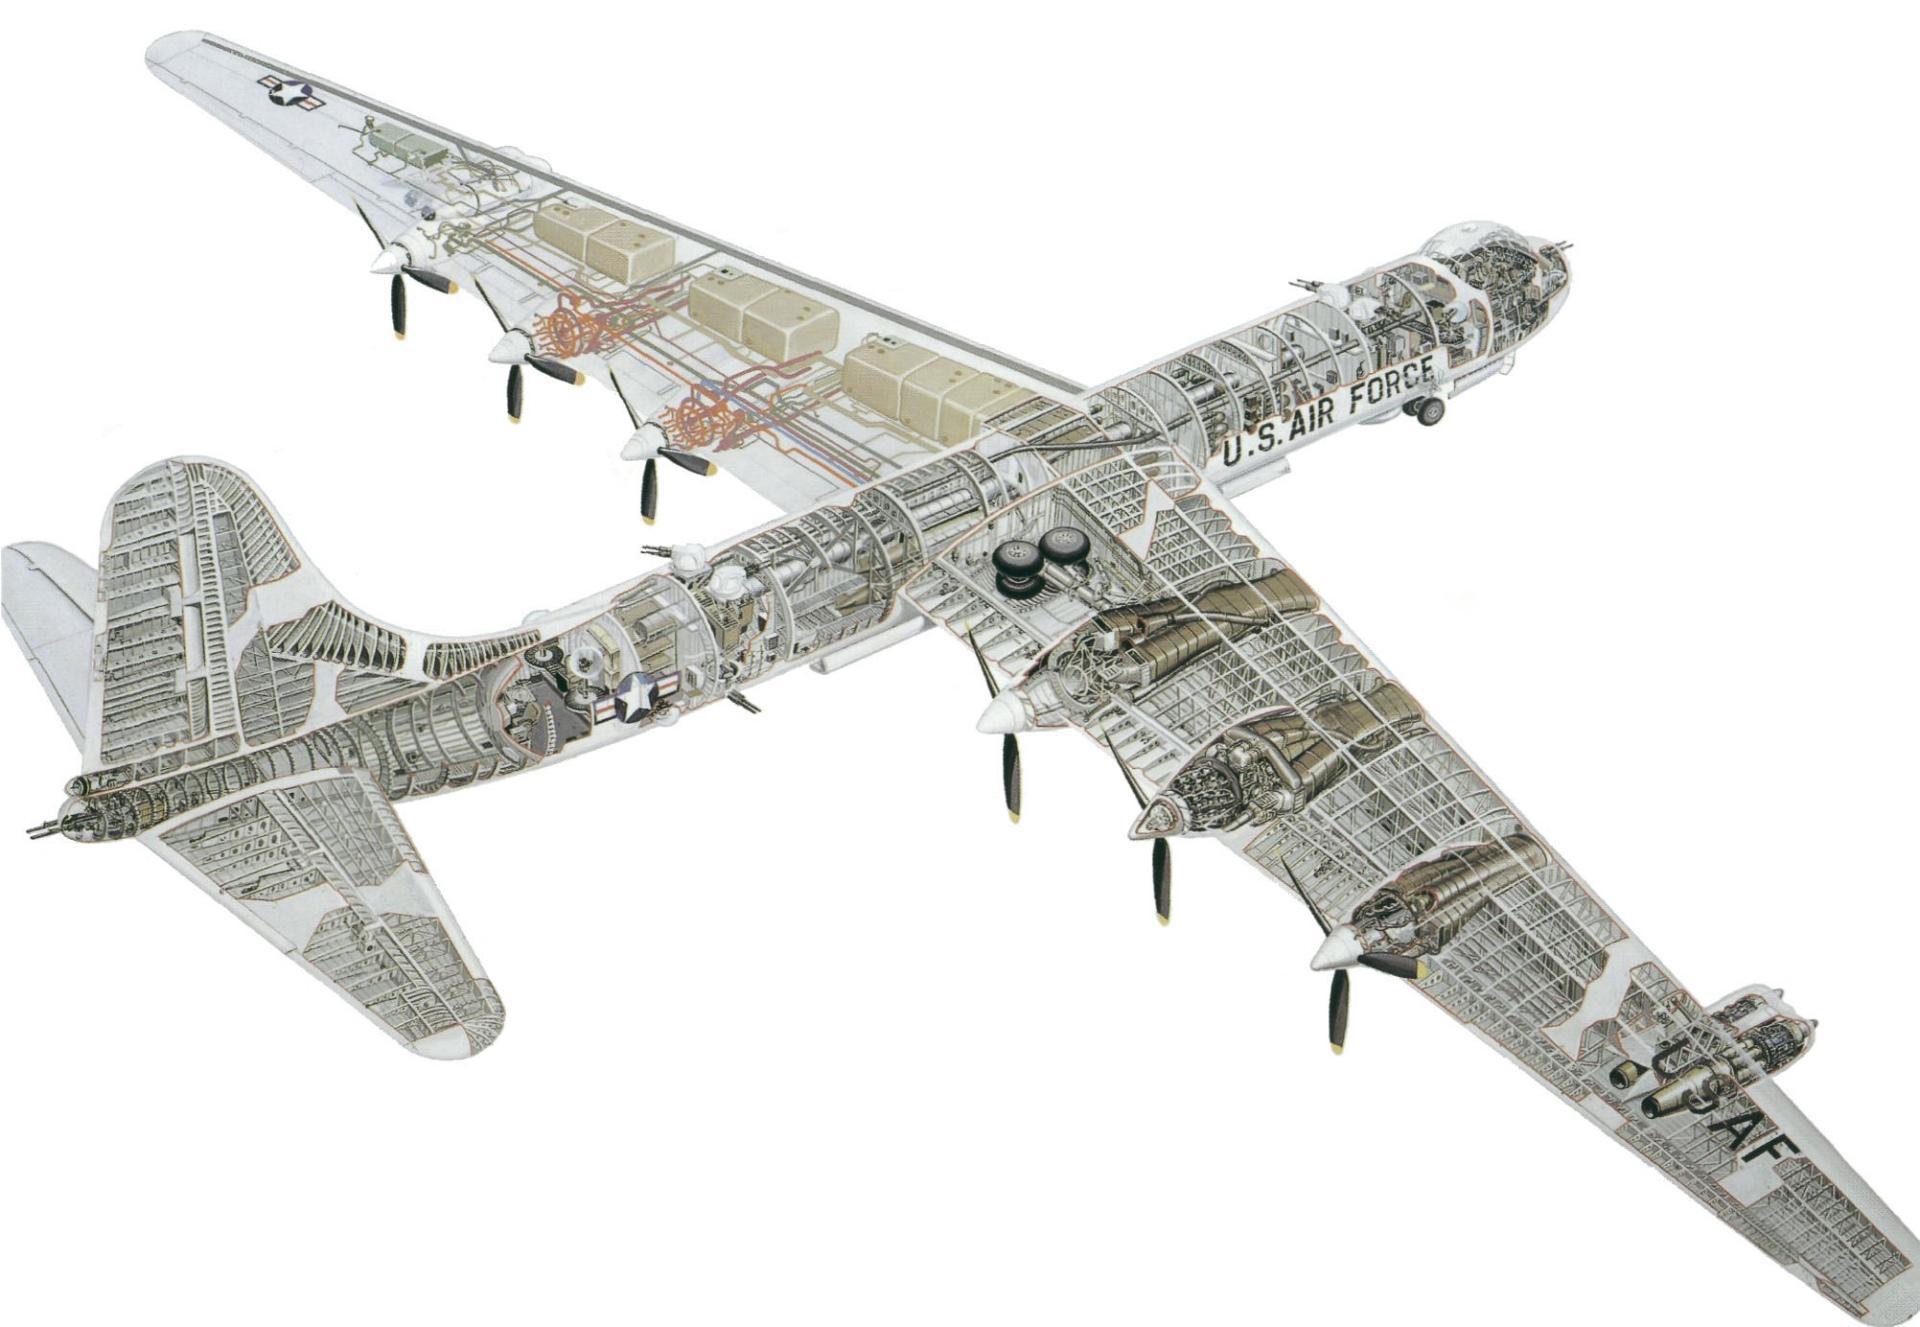 Convair B-36 wallpapers HD quality